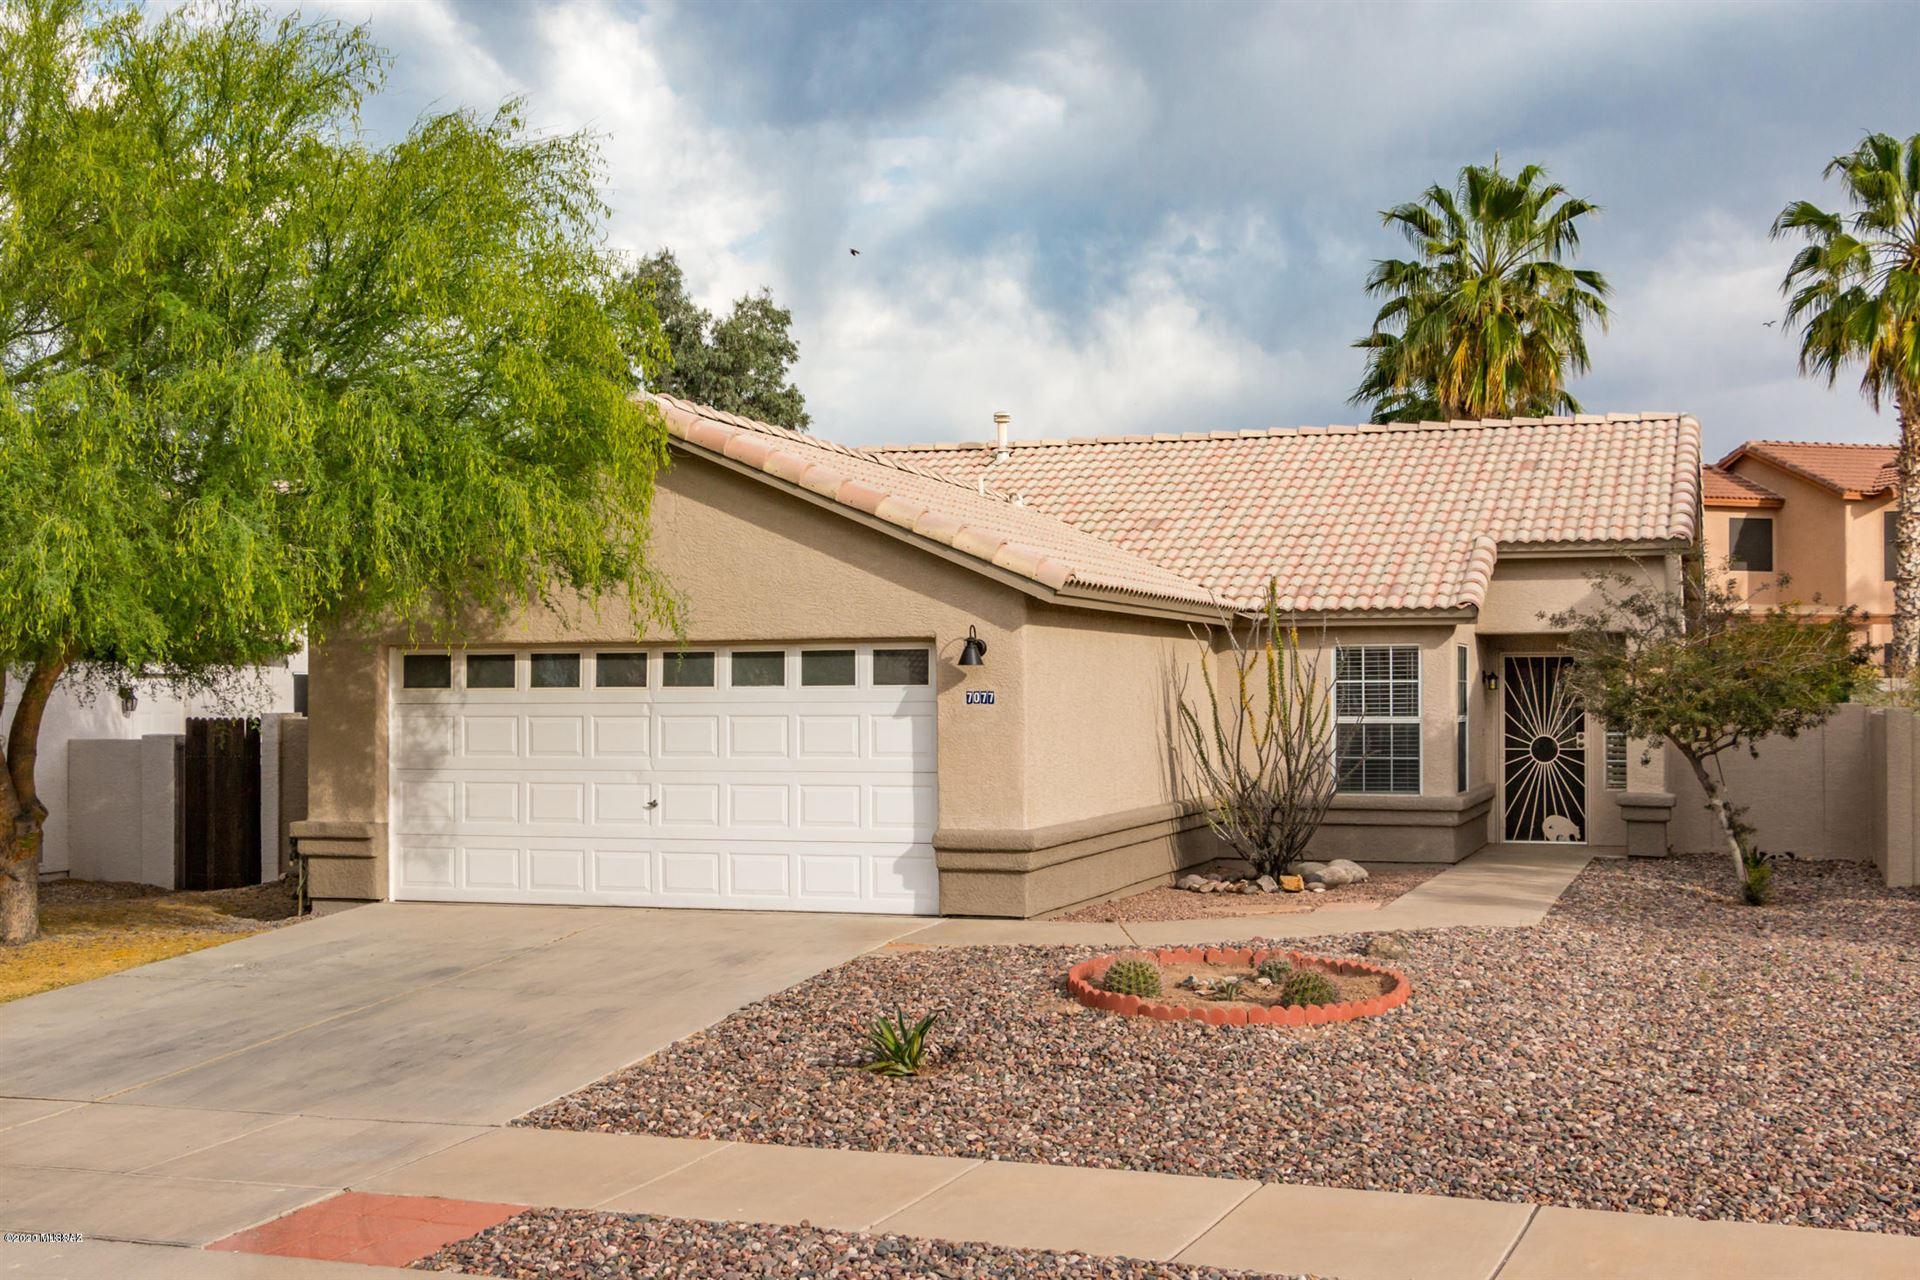 7077 W Amarante Drive, Tucson, AZ 85743 - #: 22024544